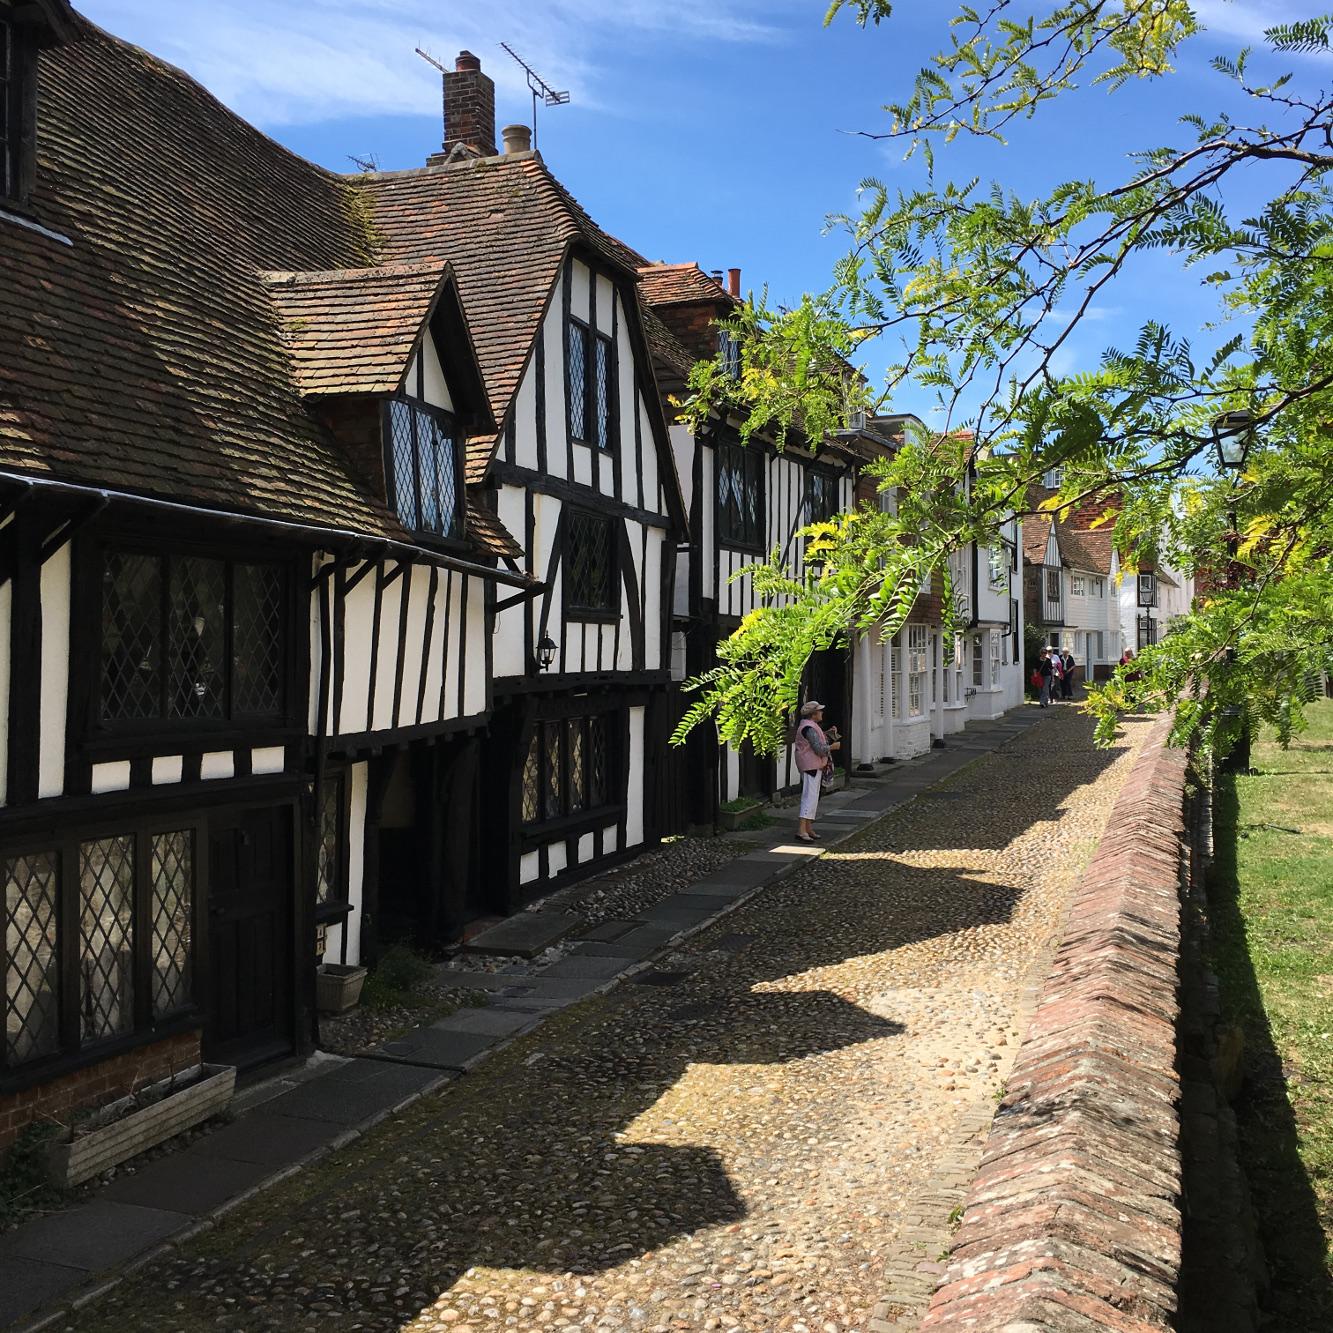 ANNE BOLEYN AND THE GARDEN OF ENGLAND